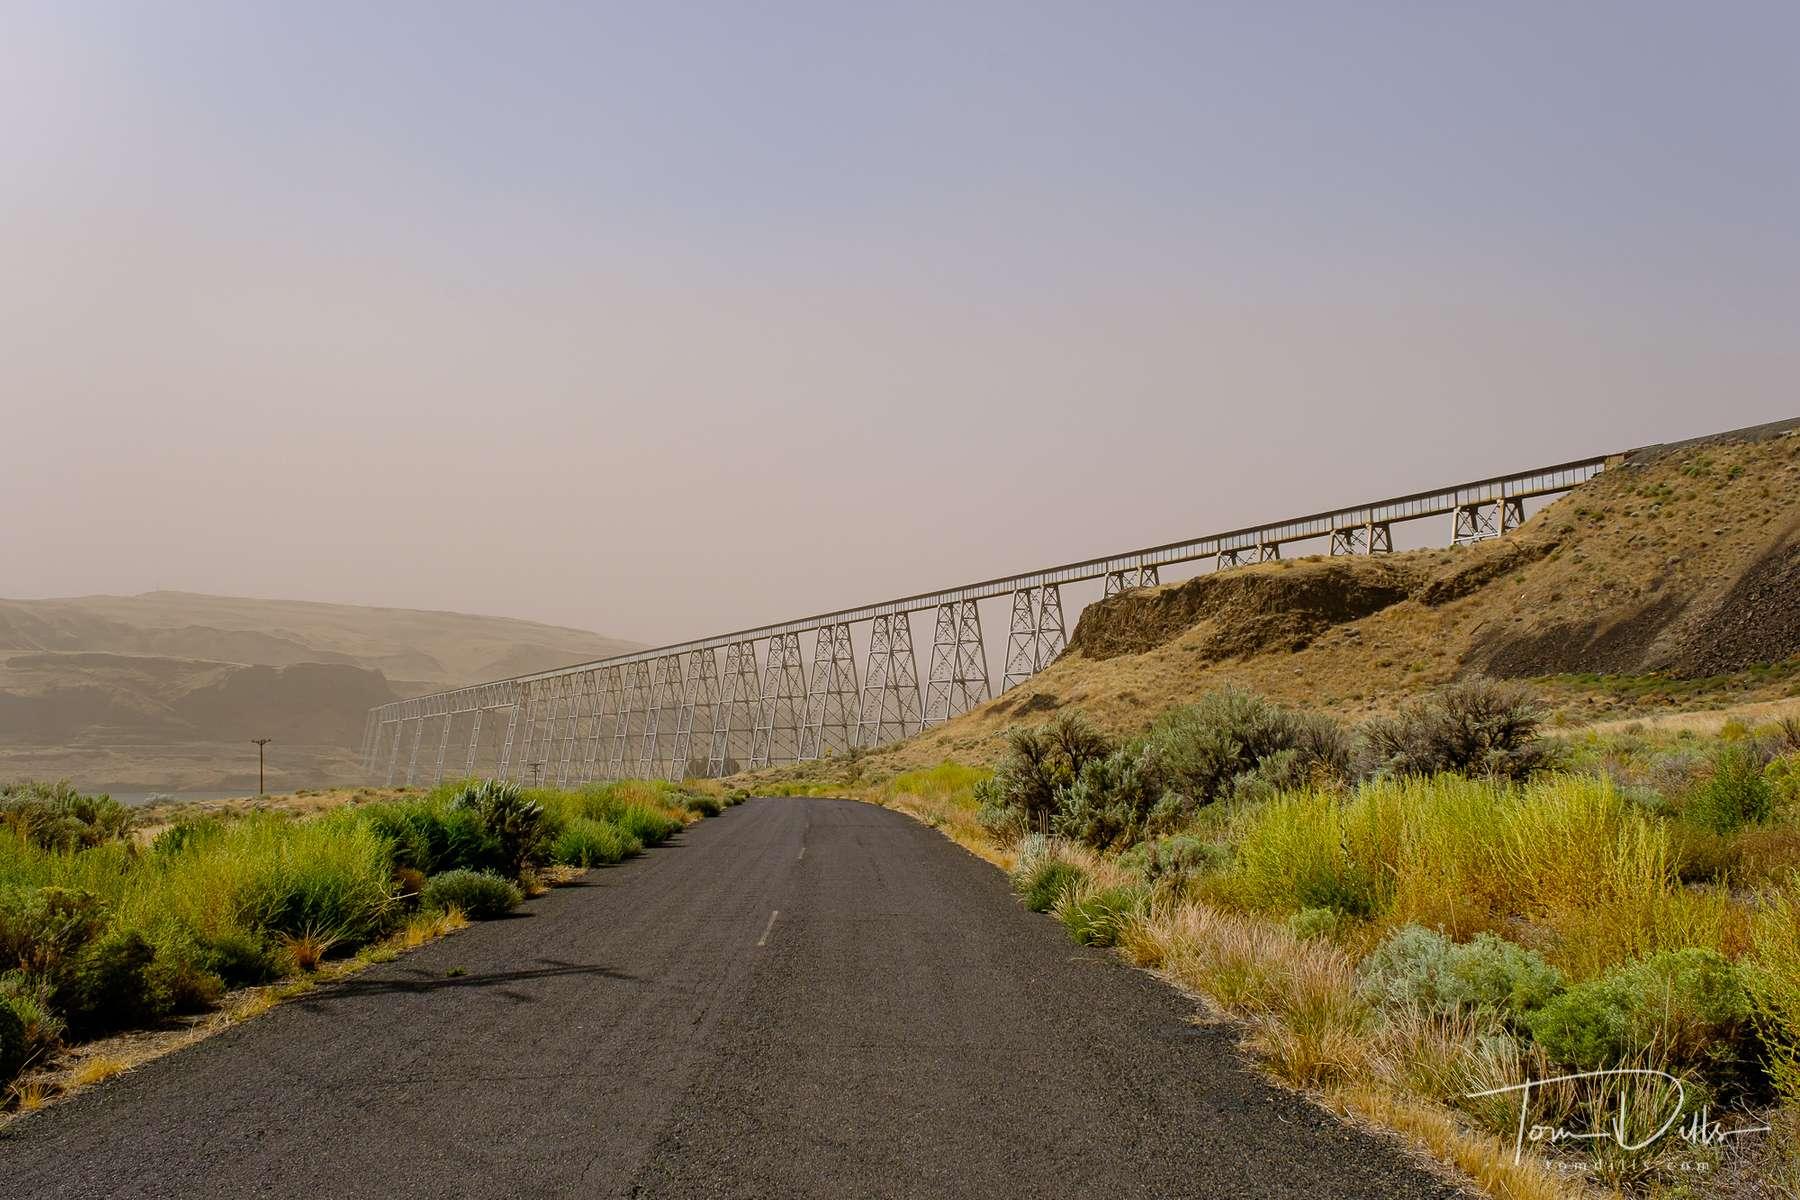 Railroad trestle across the Snake River near Perry, Washington